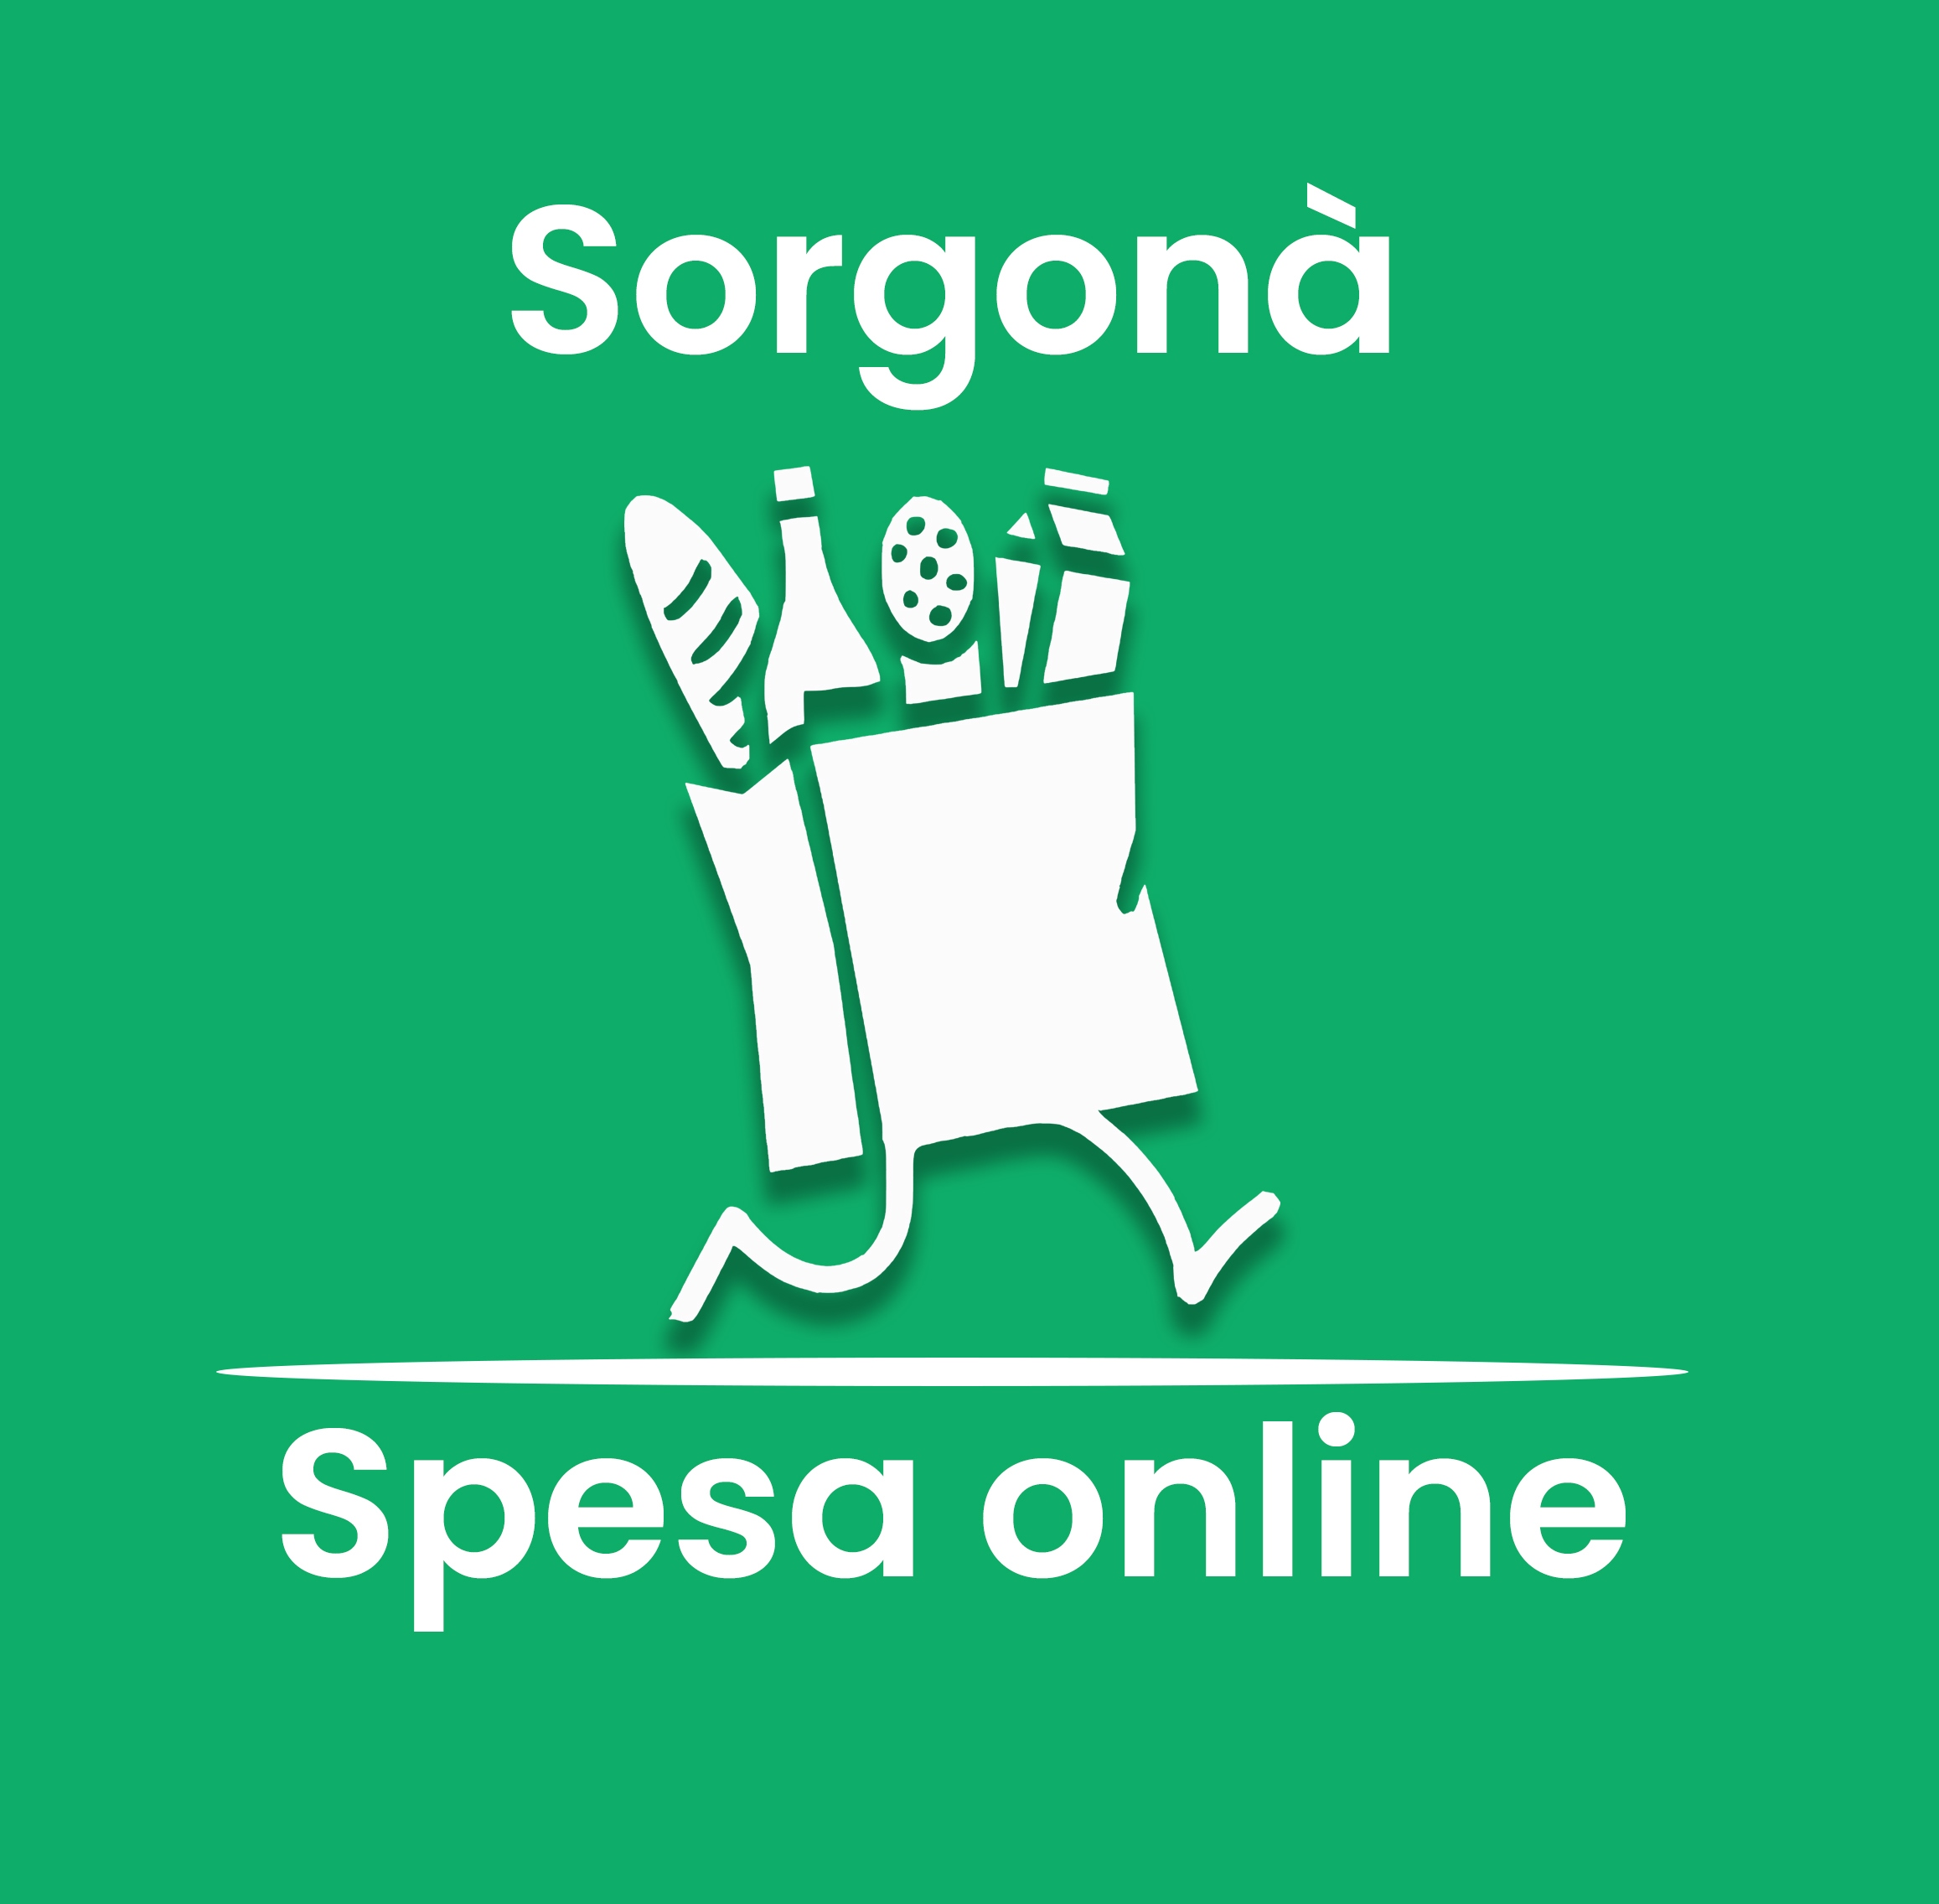 Soegon%c3%a0 market defintiivo 1